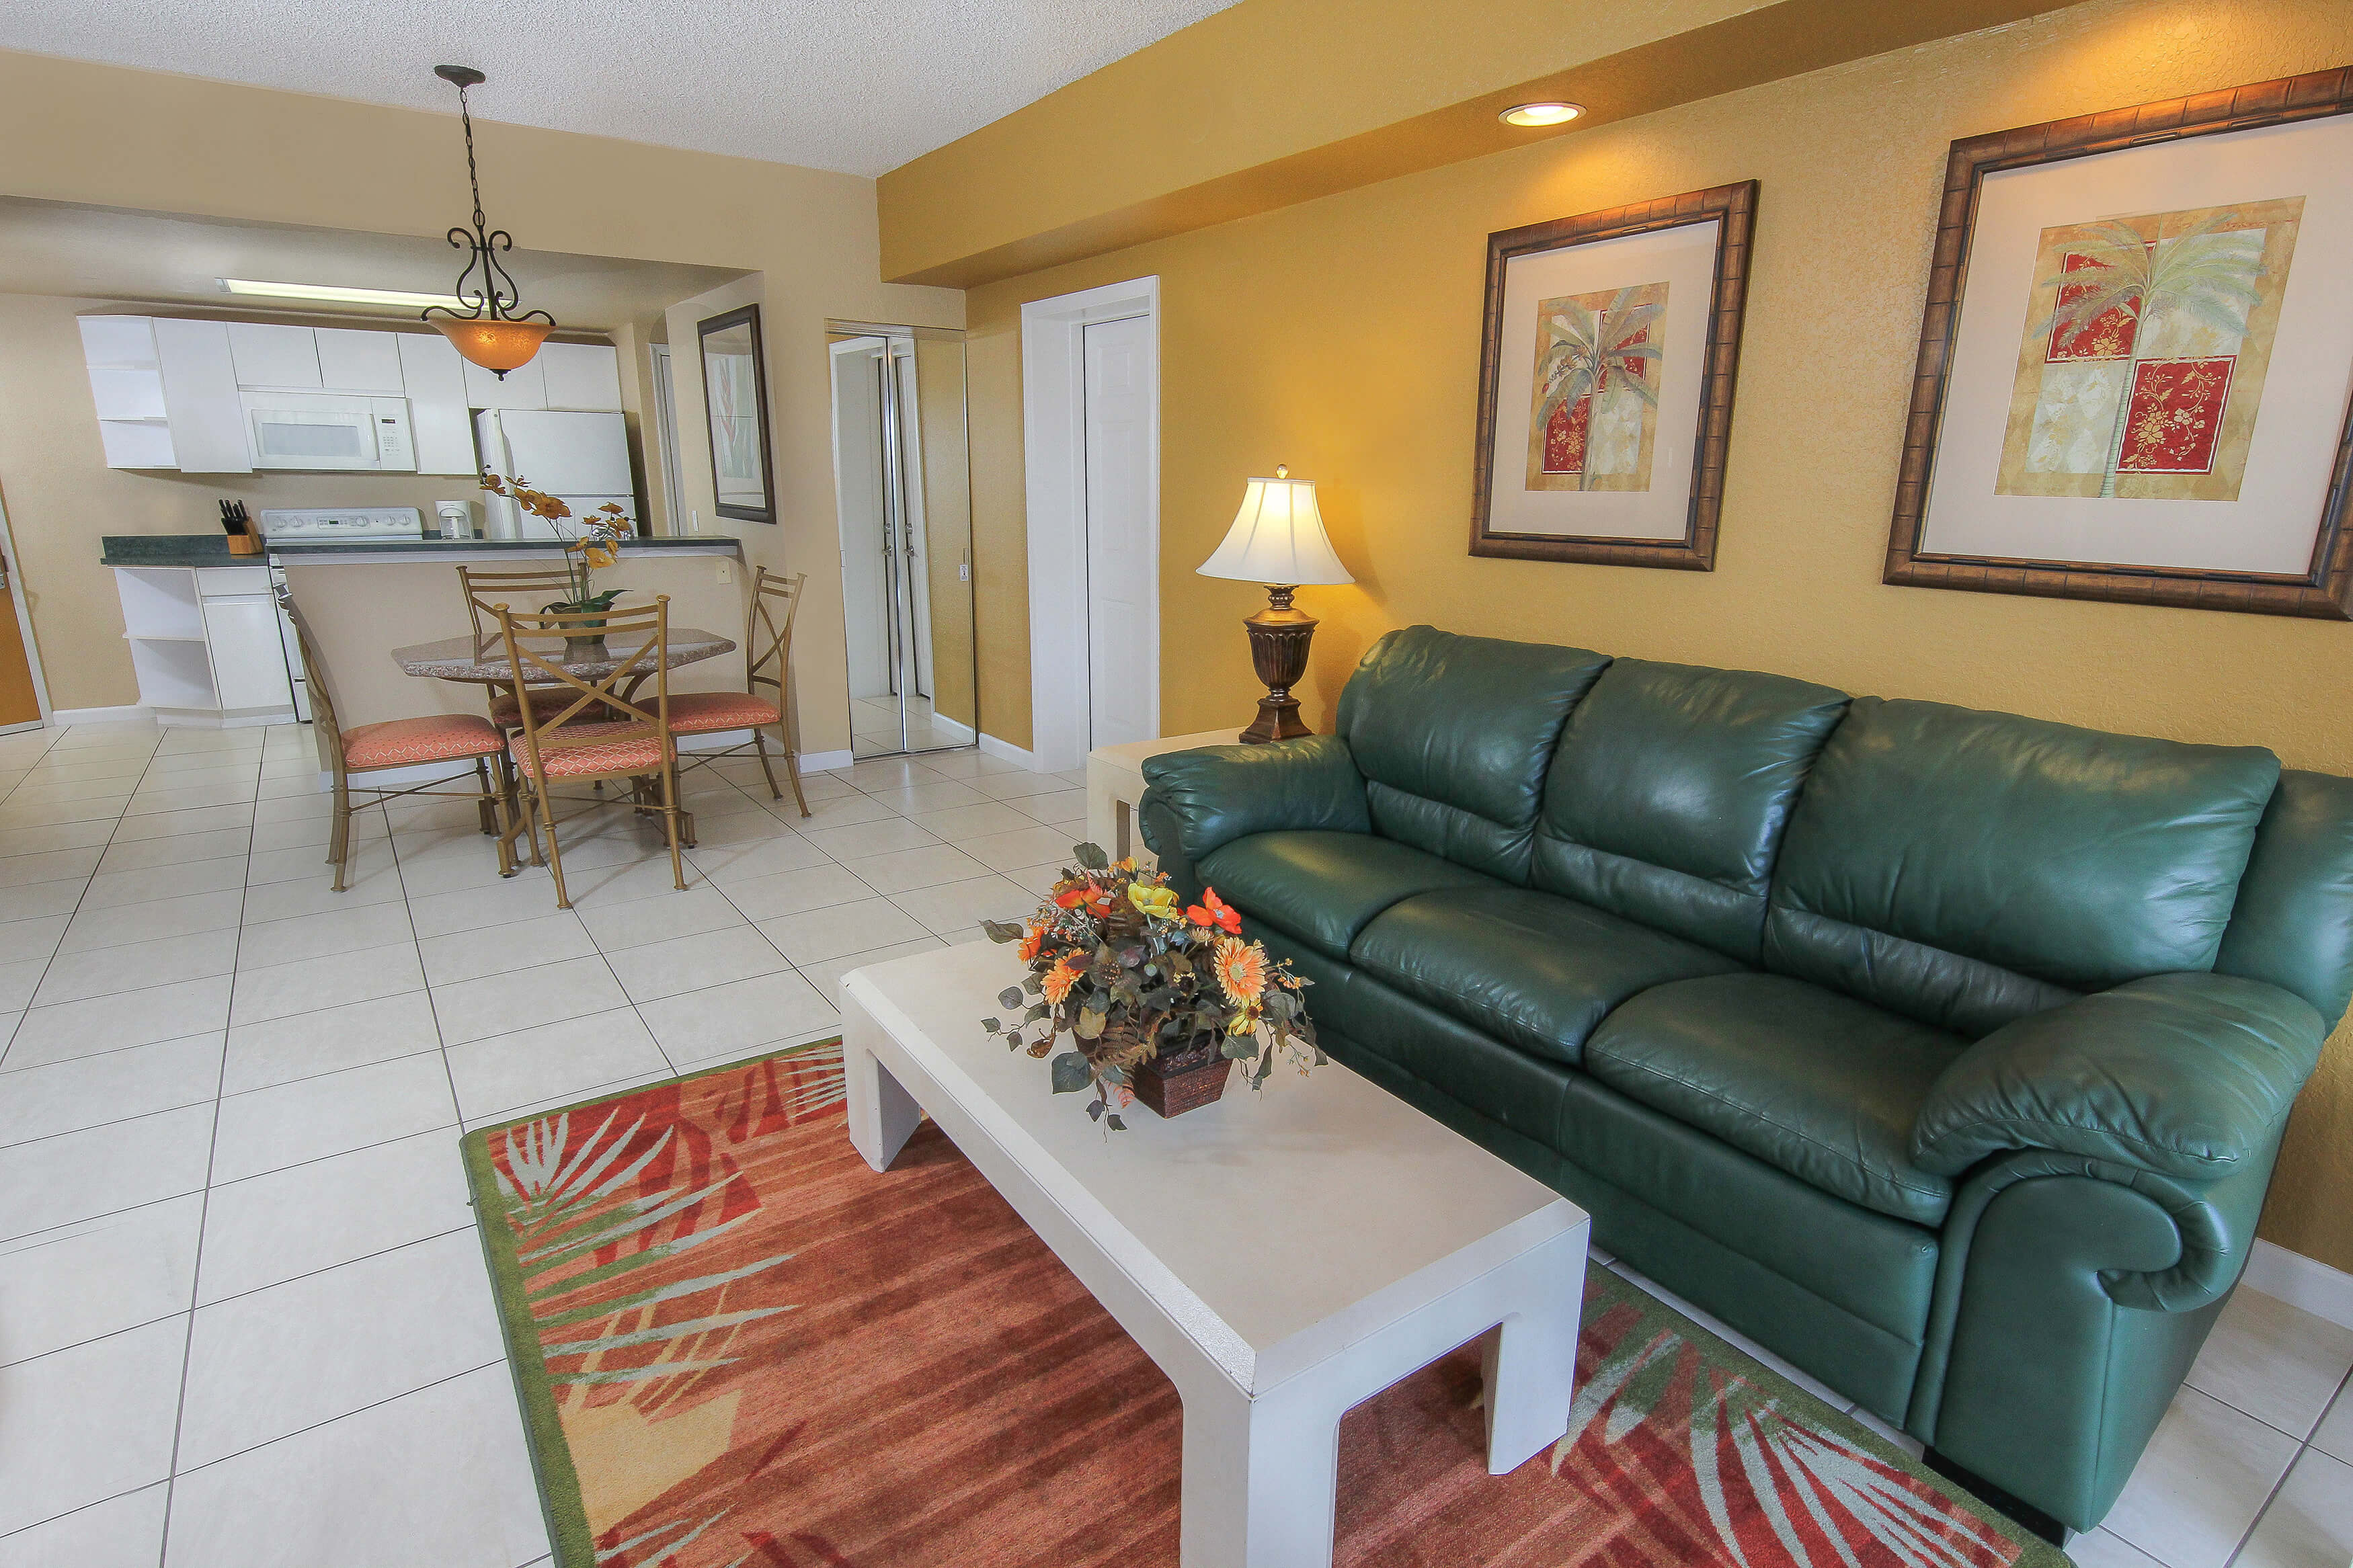 One Bedroom Villas at our hotel villas in Orlando Florida | Westgate Towers Resort | Westgate Resorts